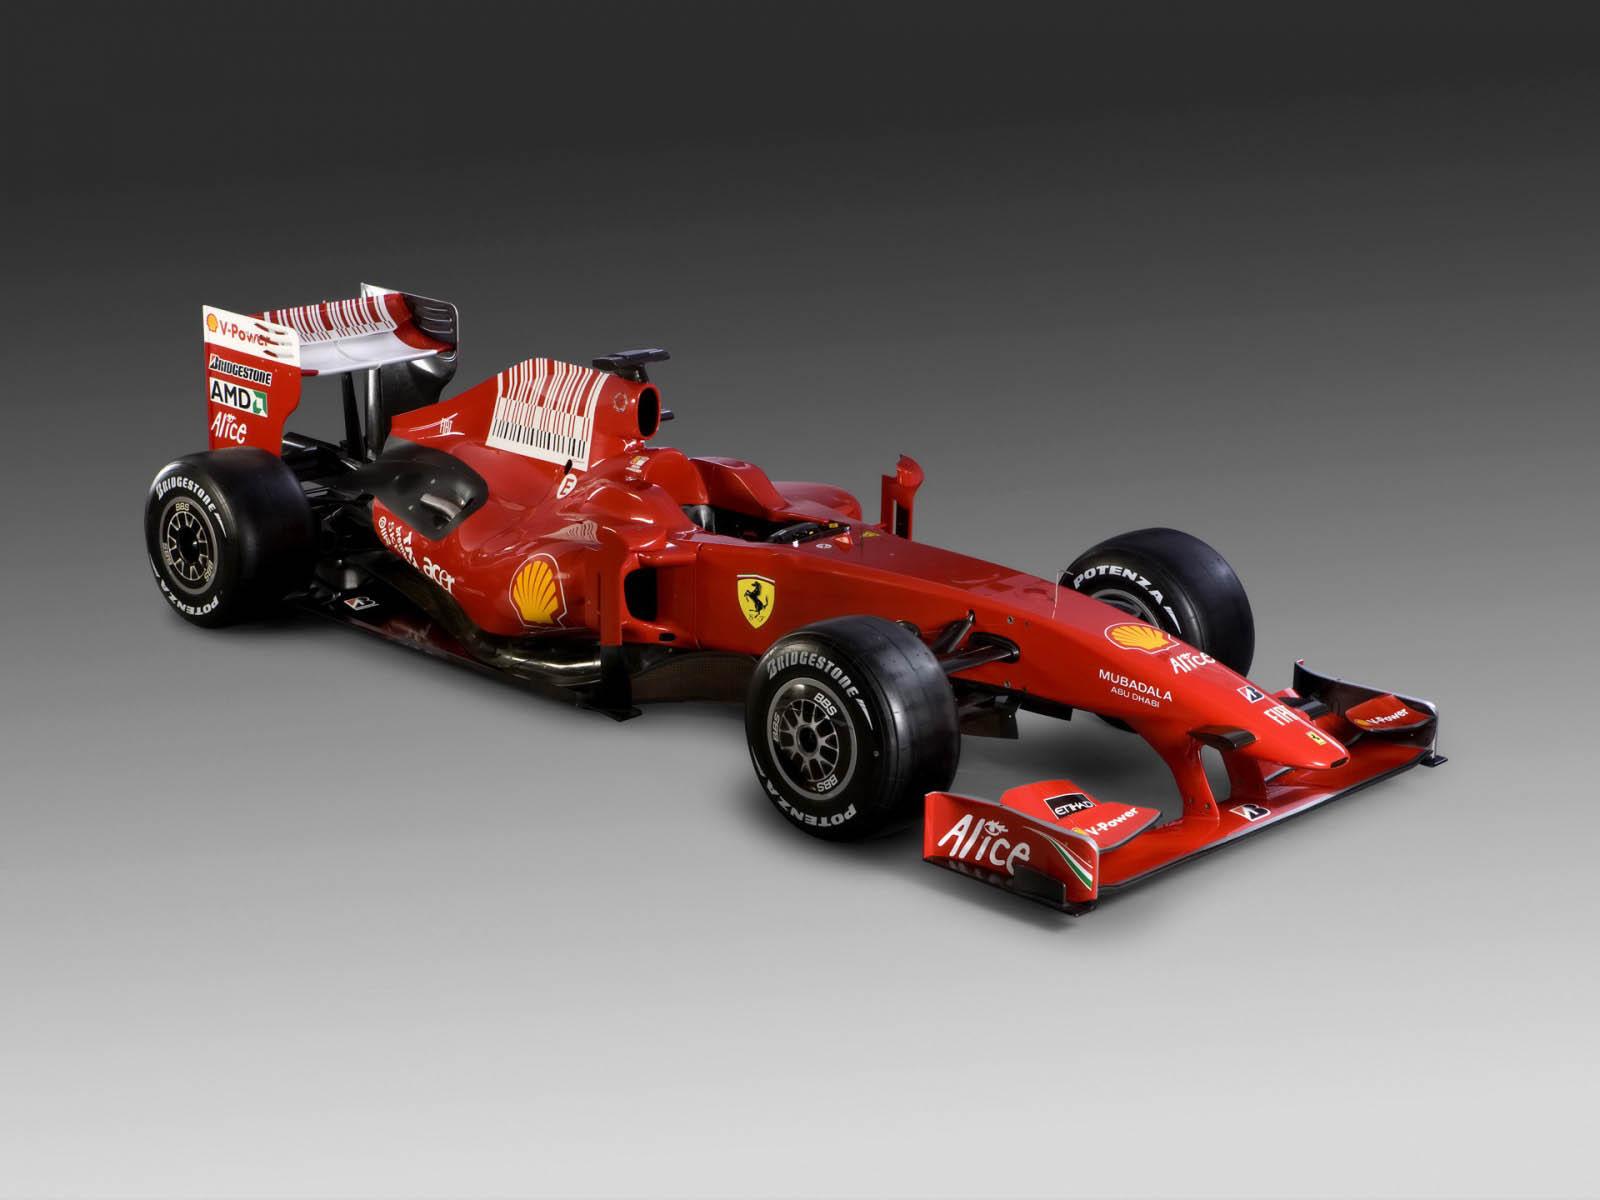 Wallpaper Mobil Balap Sport: Wallpaper Mobil Balap Formula 1